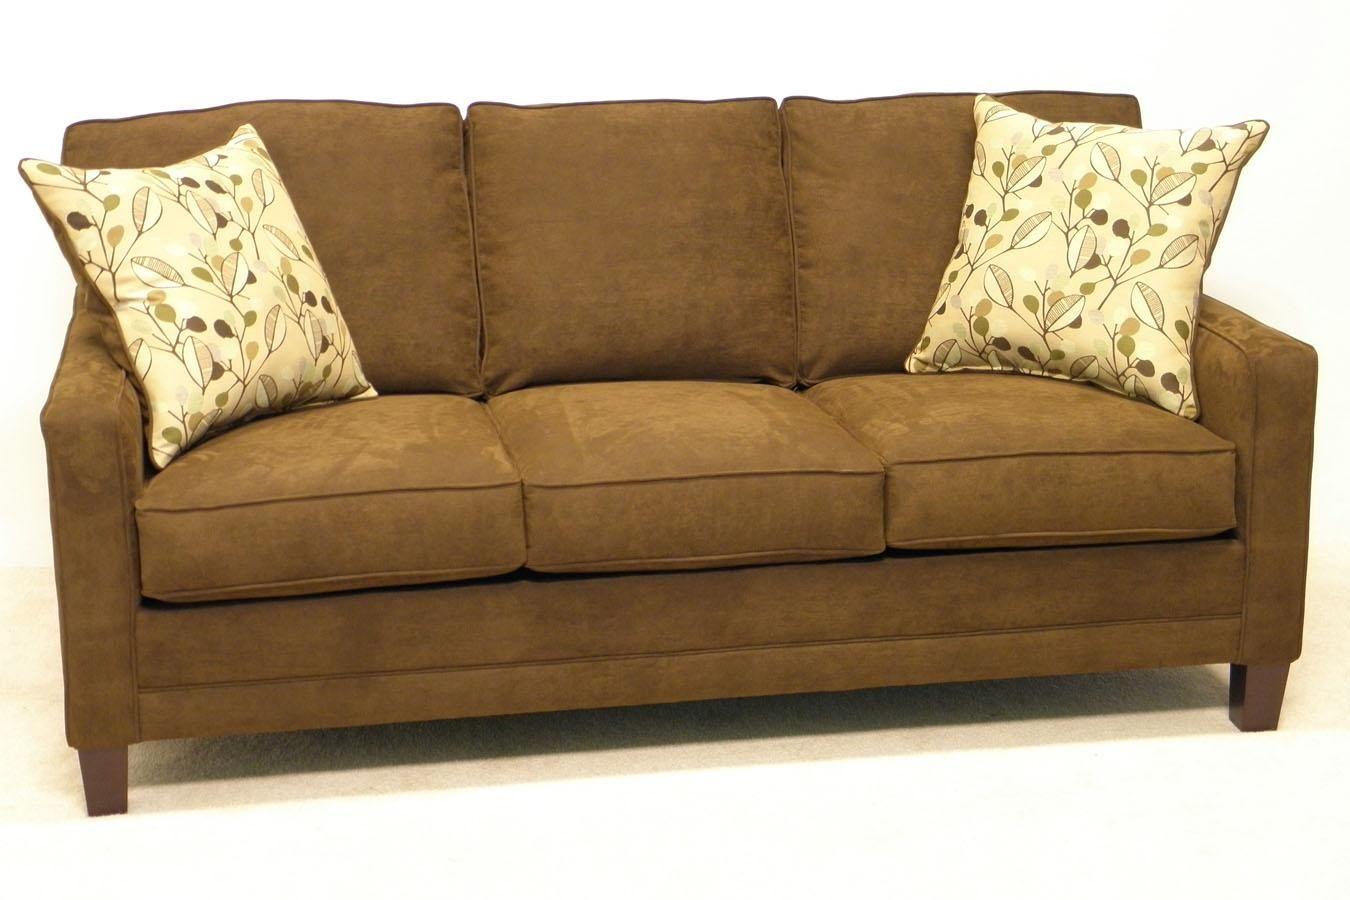 sleeper sofas chicago il harris tweed scotland 665 queen sofa by lacrosse new